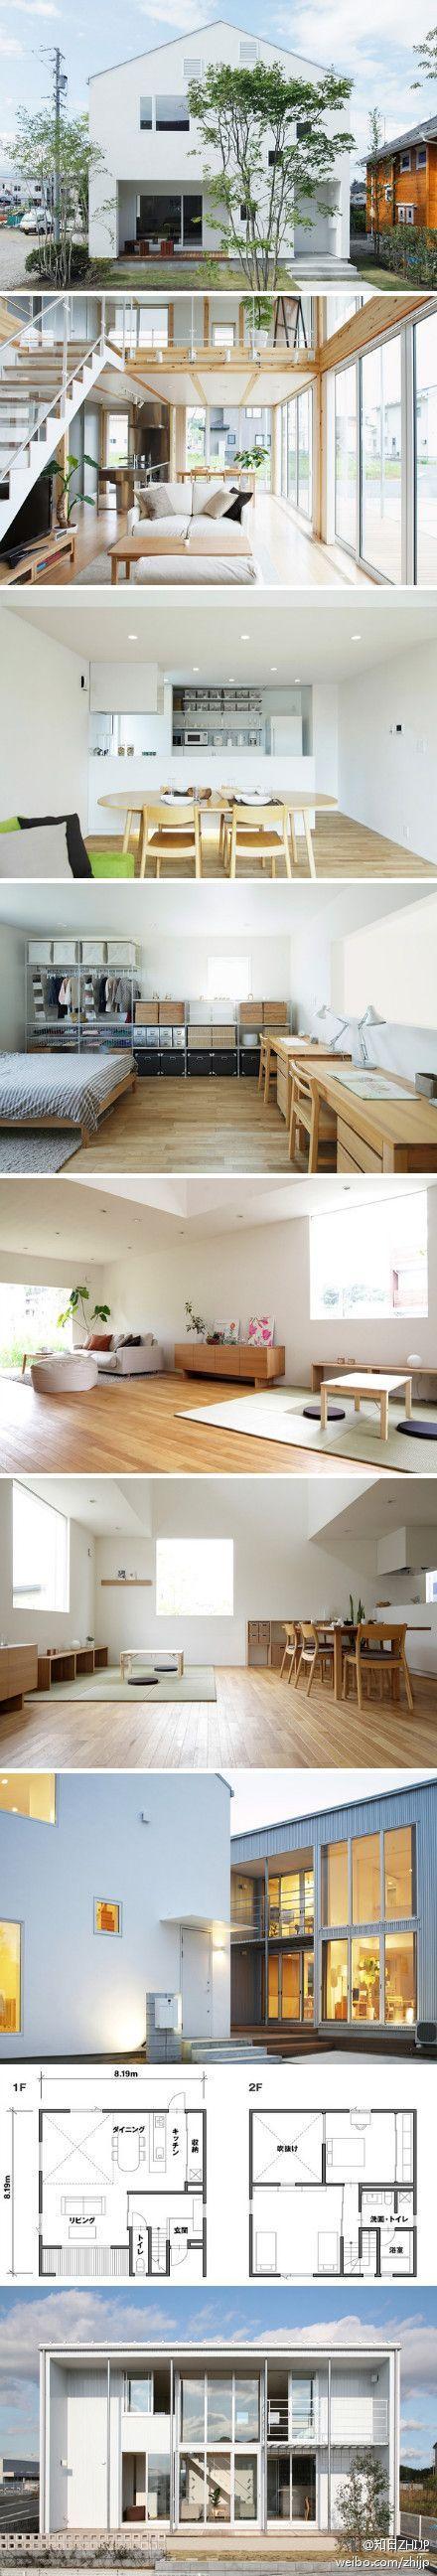 Muji Home. Japanese design. Simple. Clean. Minimalist.